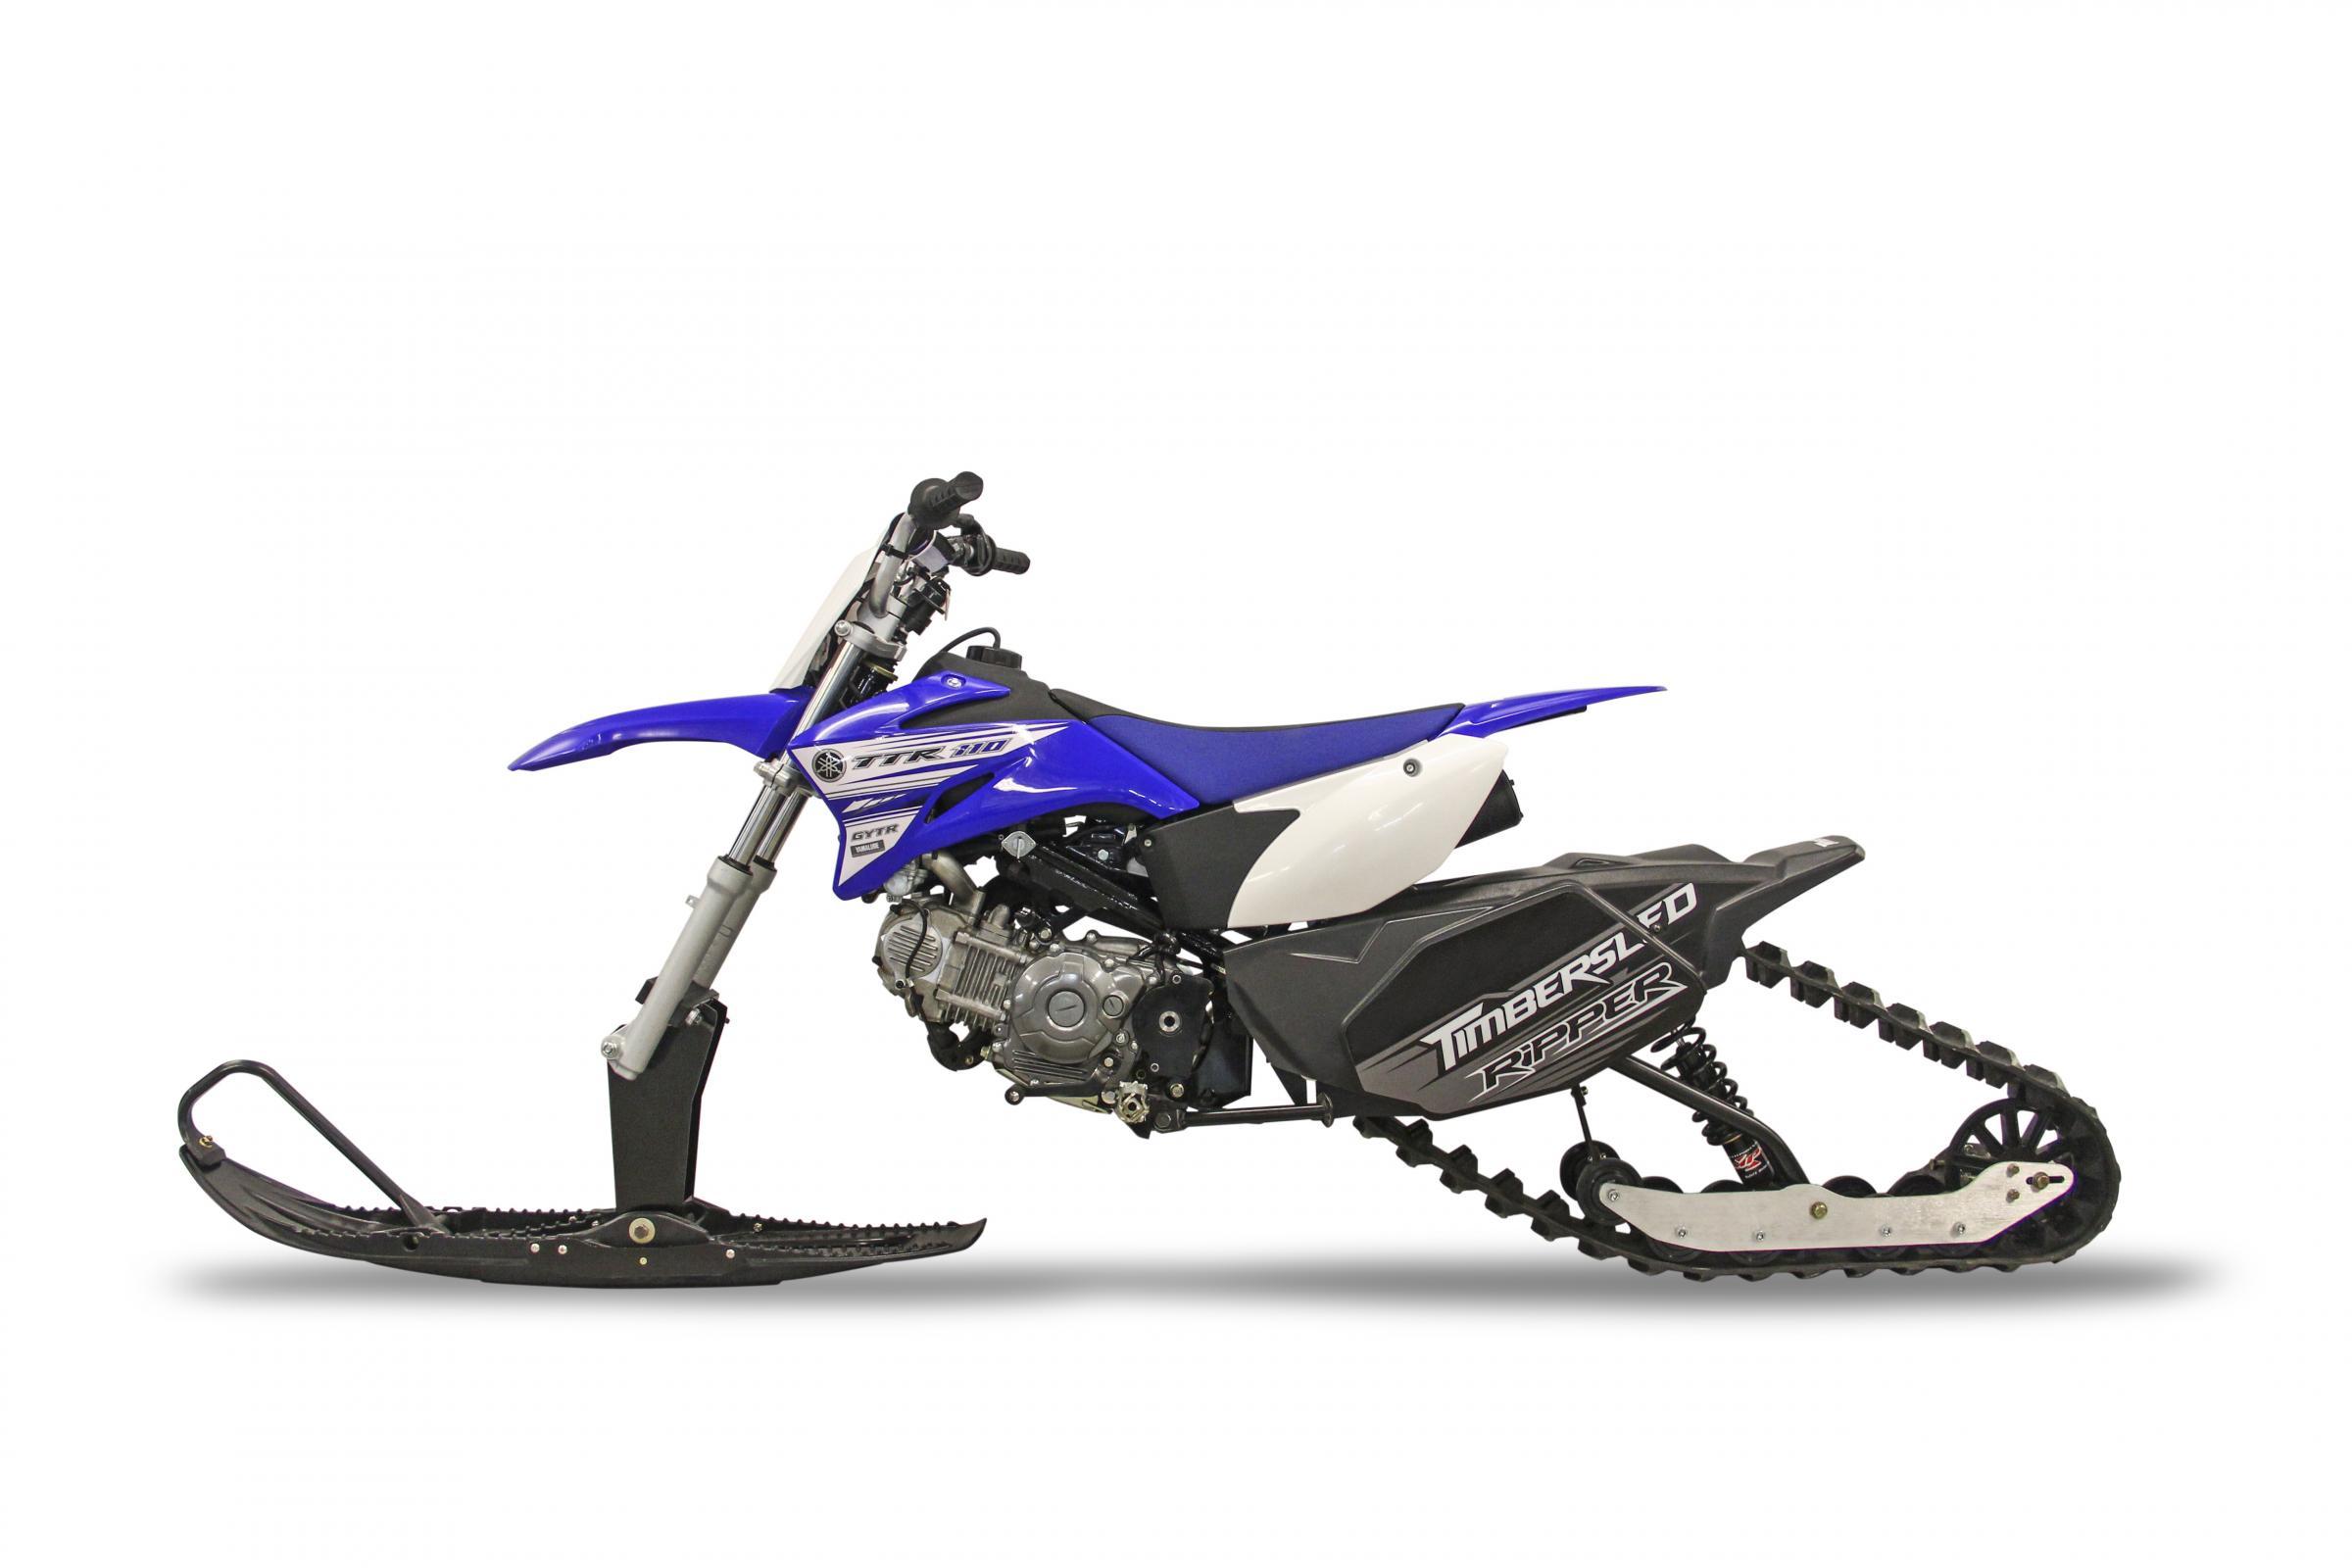 New Timbersled™ ST 90 Ripper Systems Convert 110cc Dirt